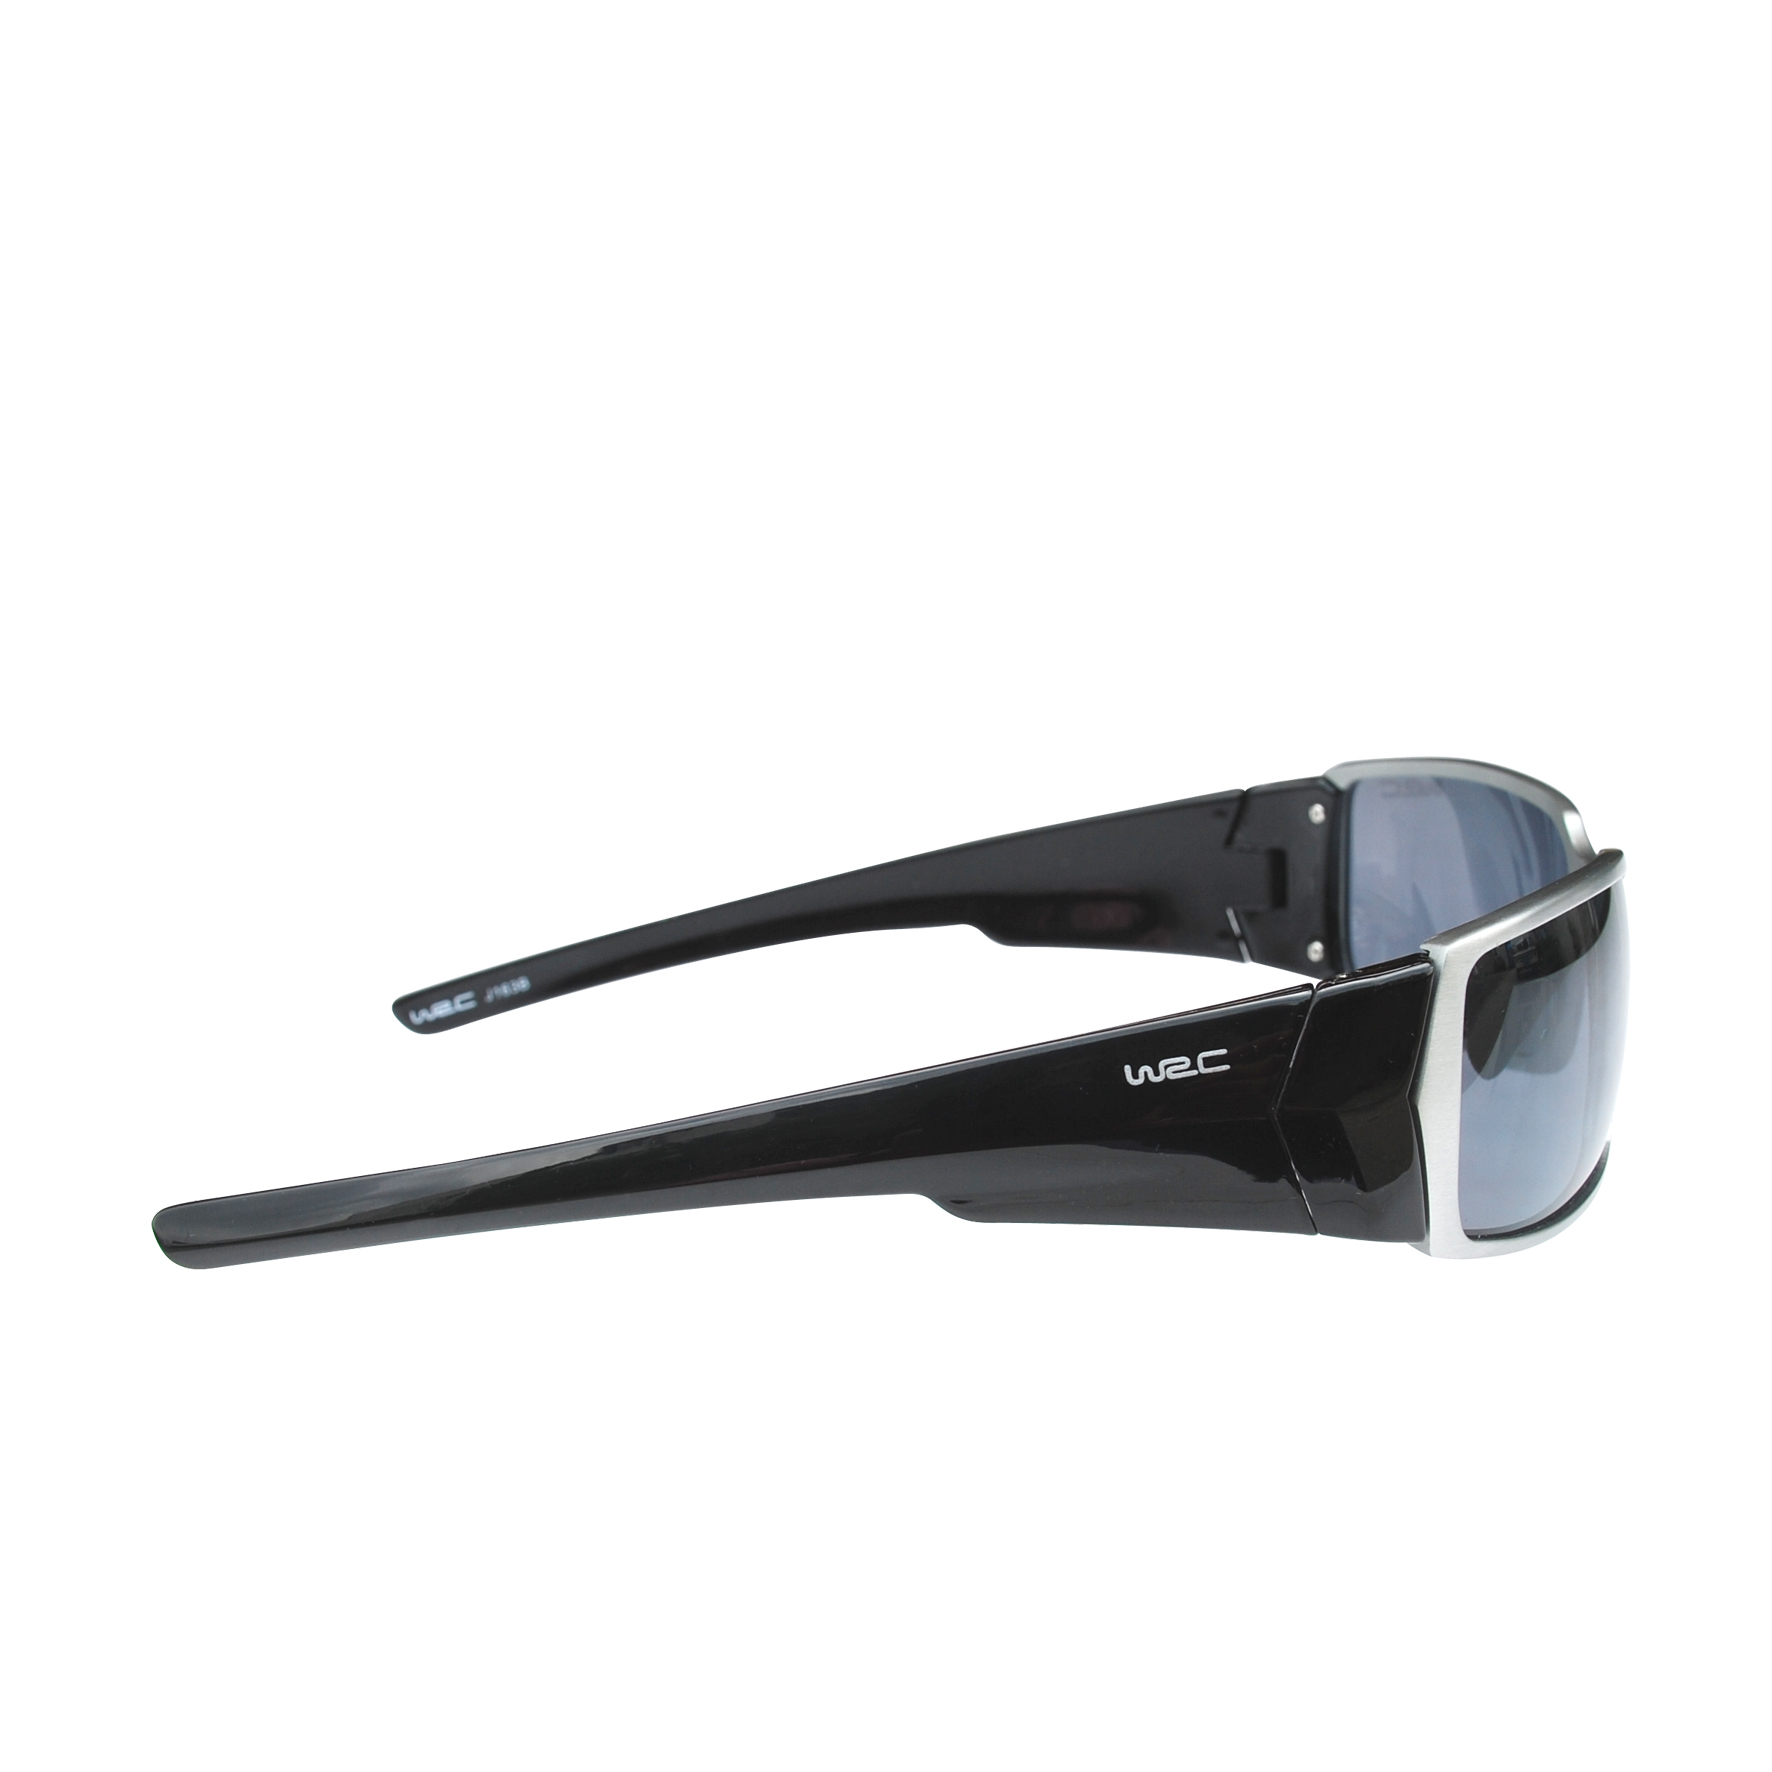 WRC运动时尚偏光汽车用太阳眼镜墨镜驾车户外司机护目镜男士新款